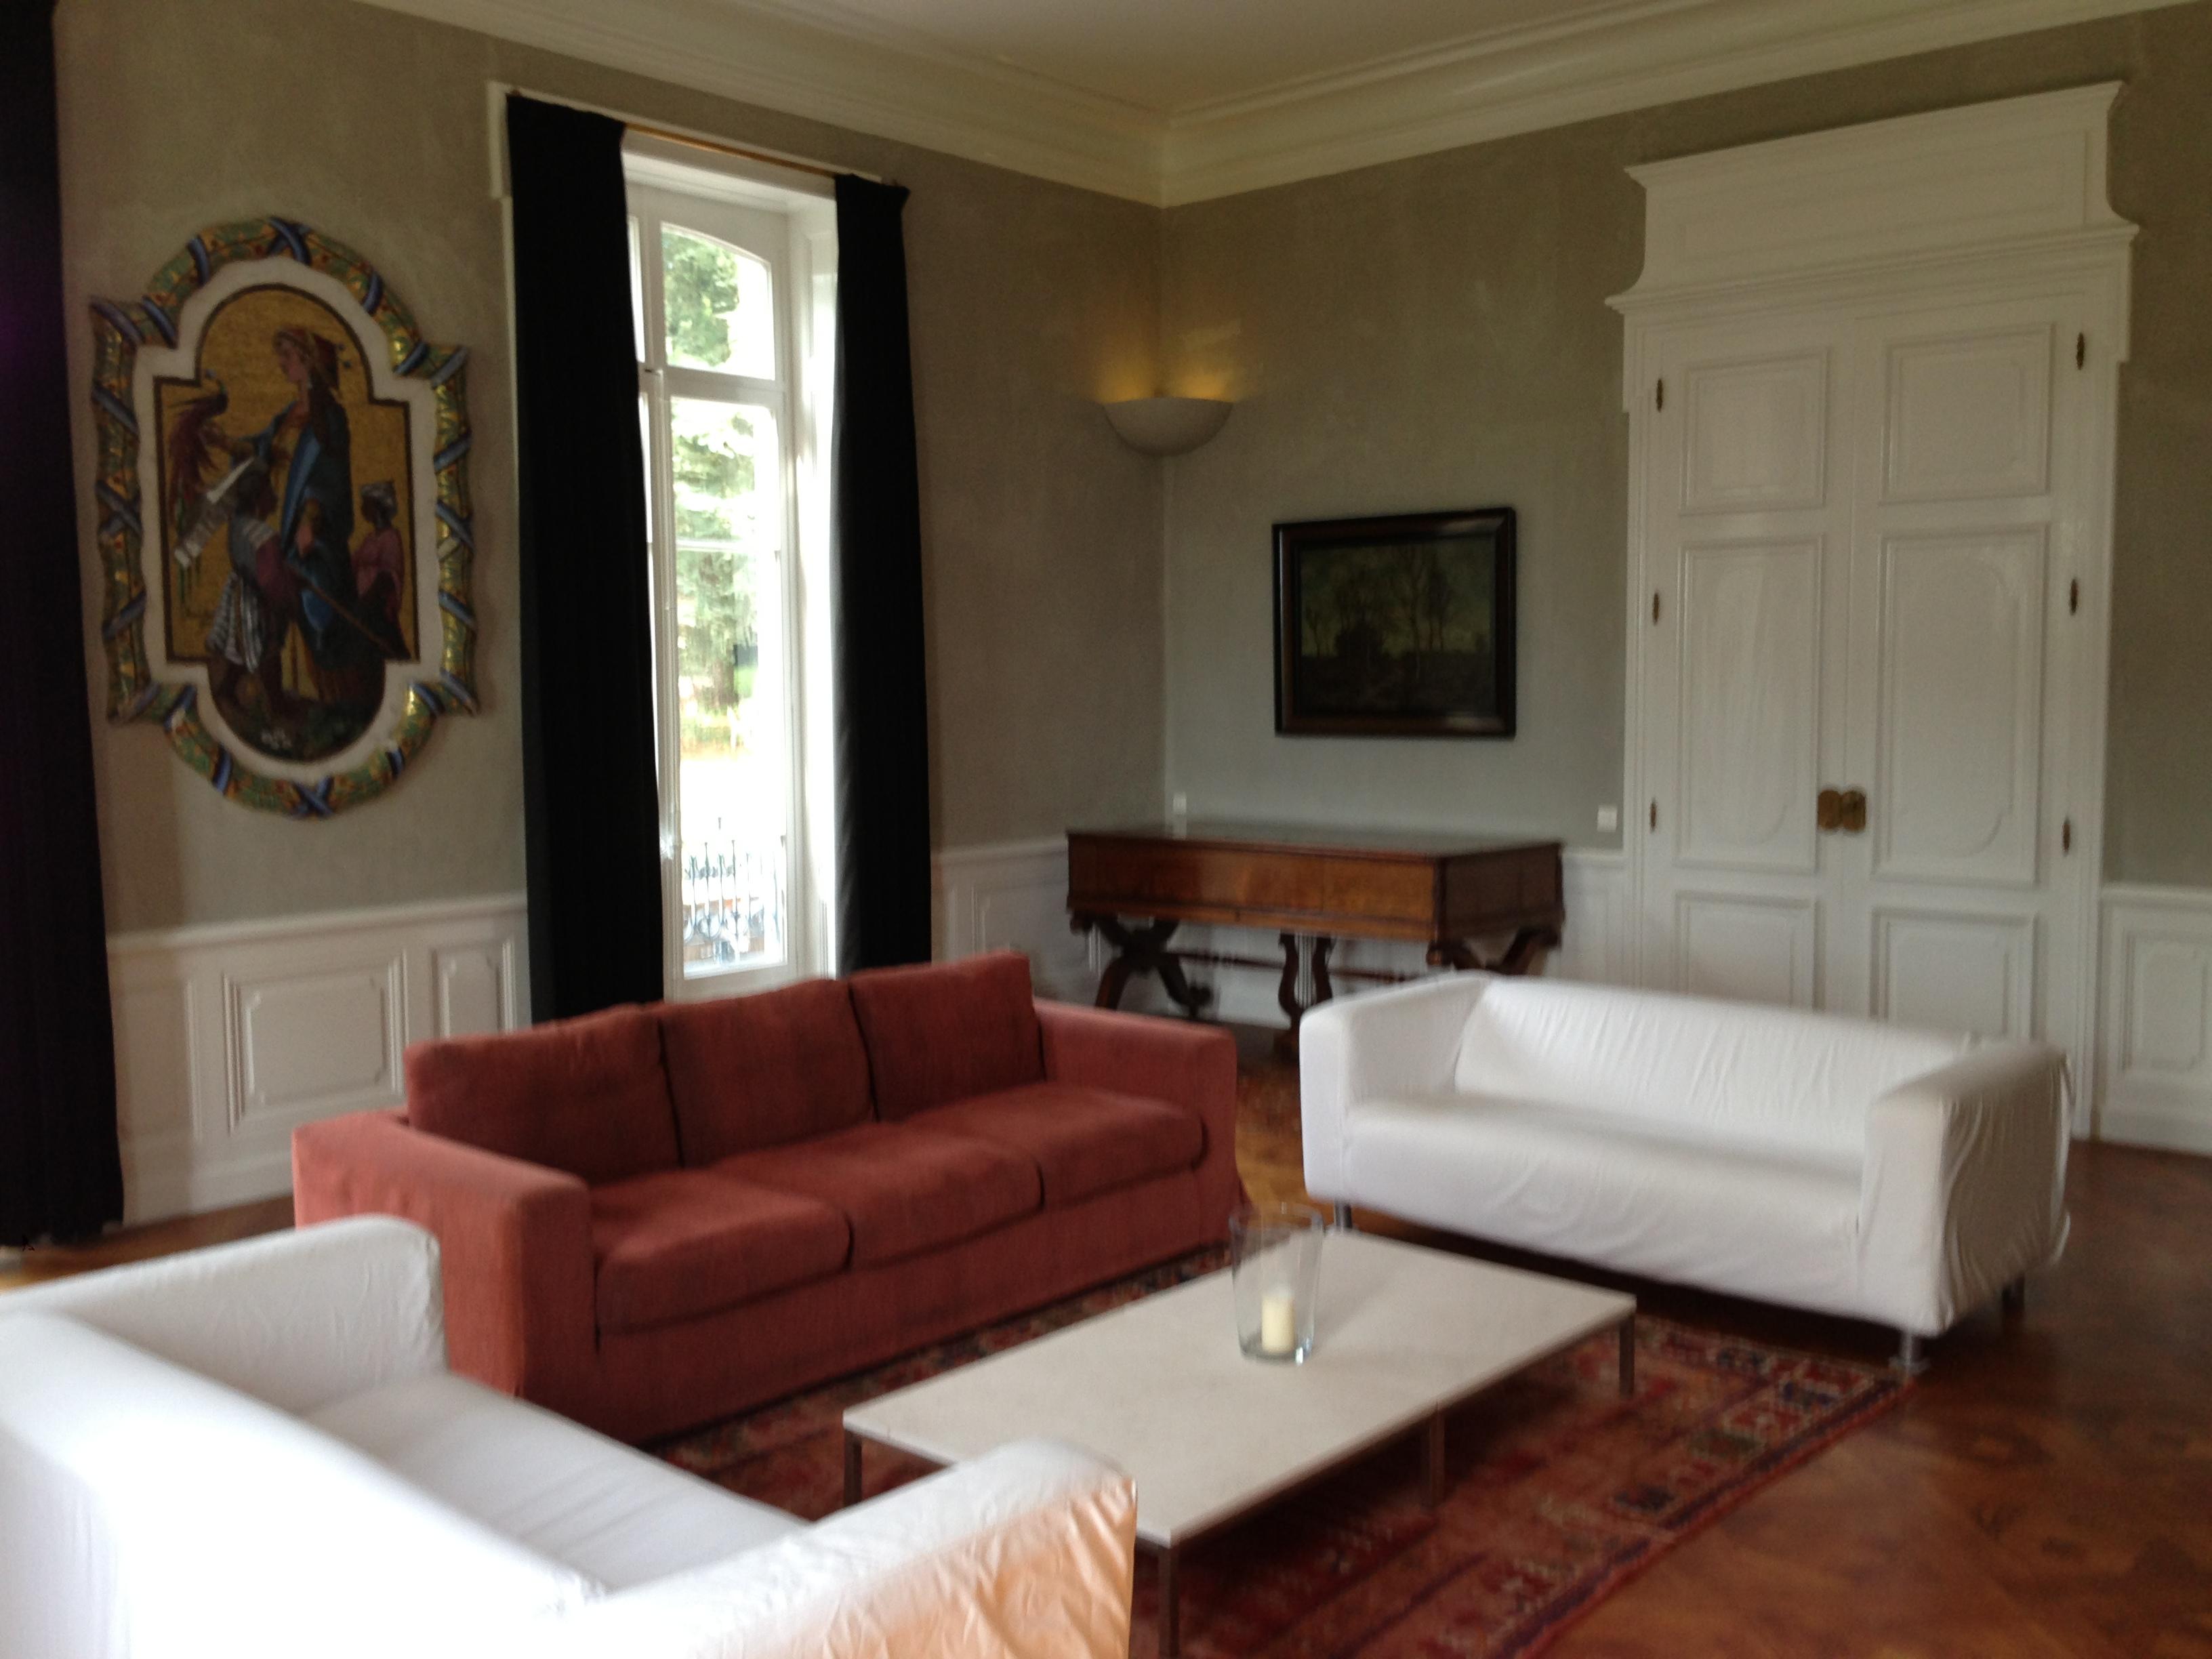 Sitting-room with mozaiek